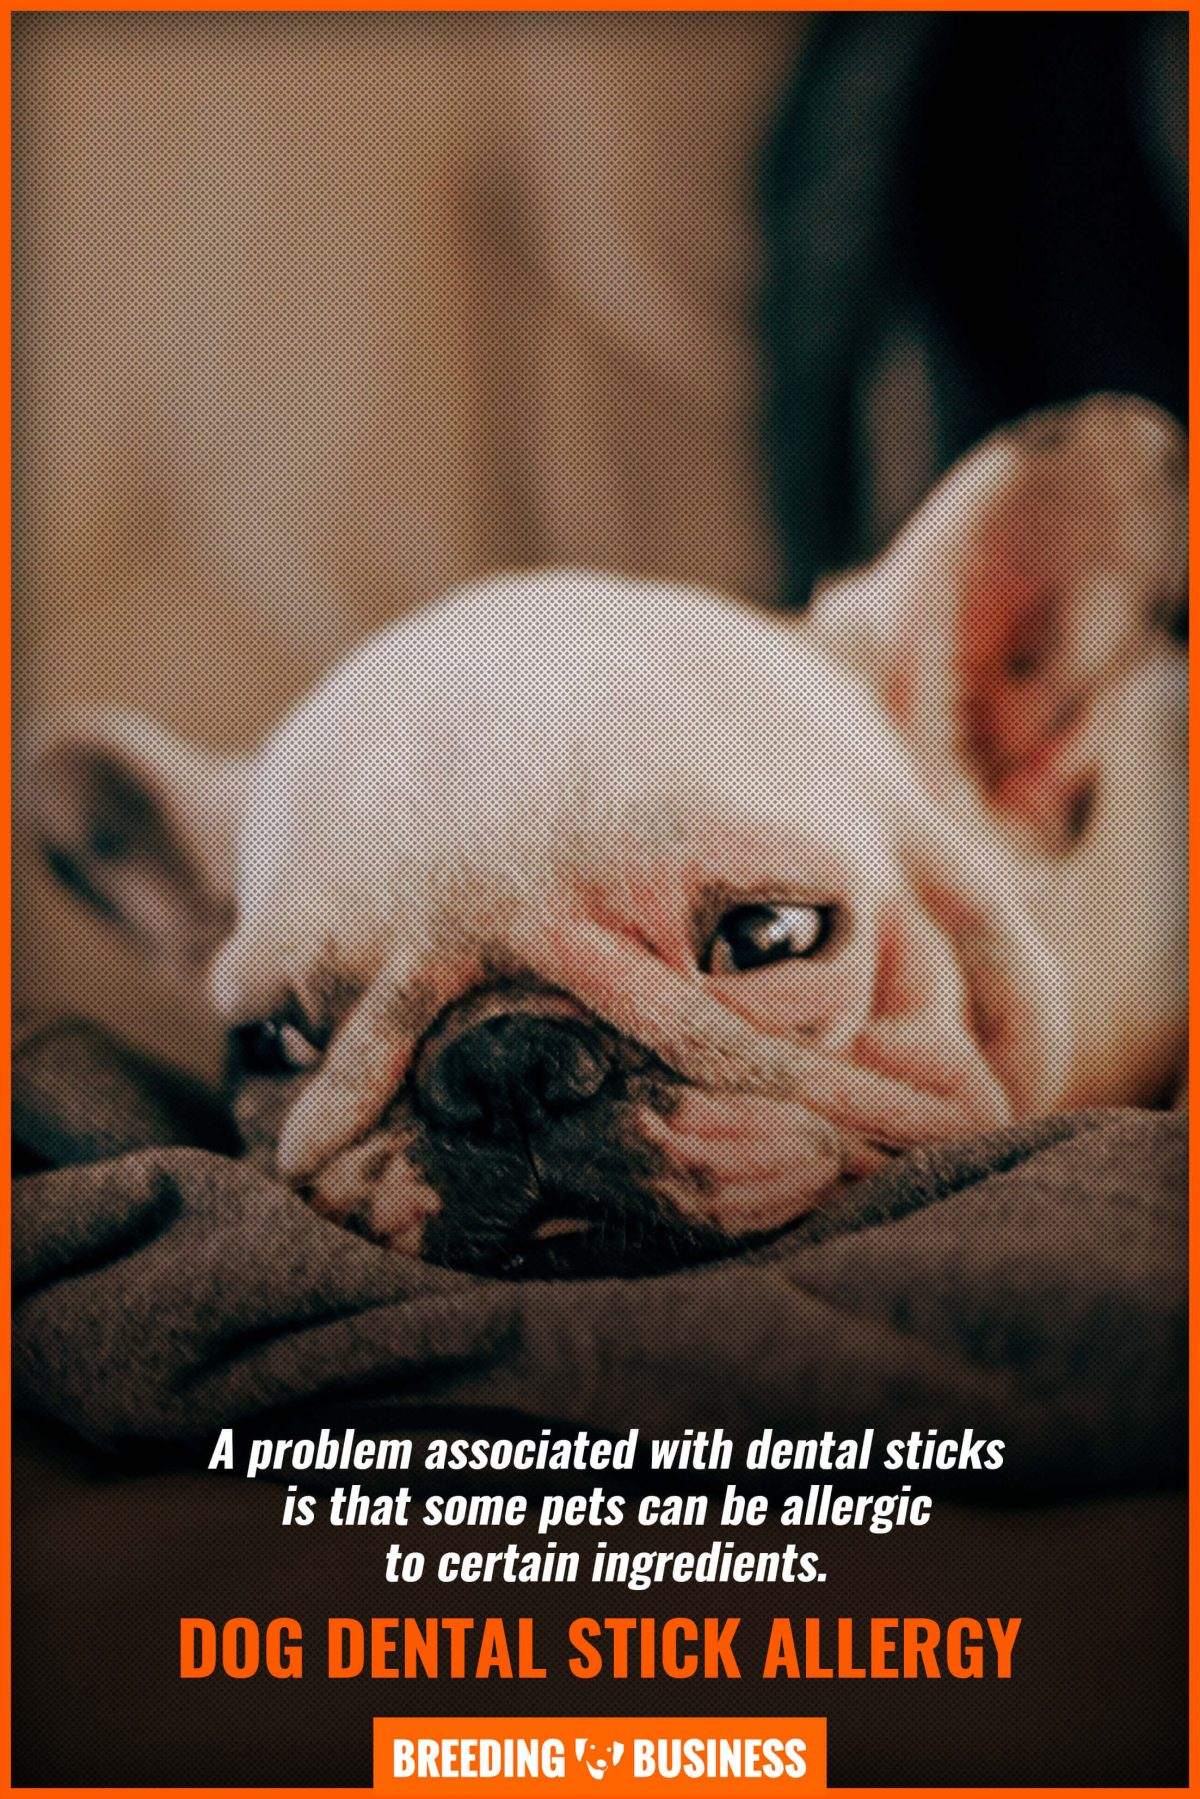 dog dental stick allergy